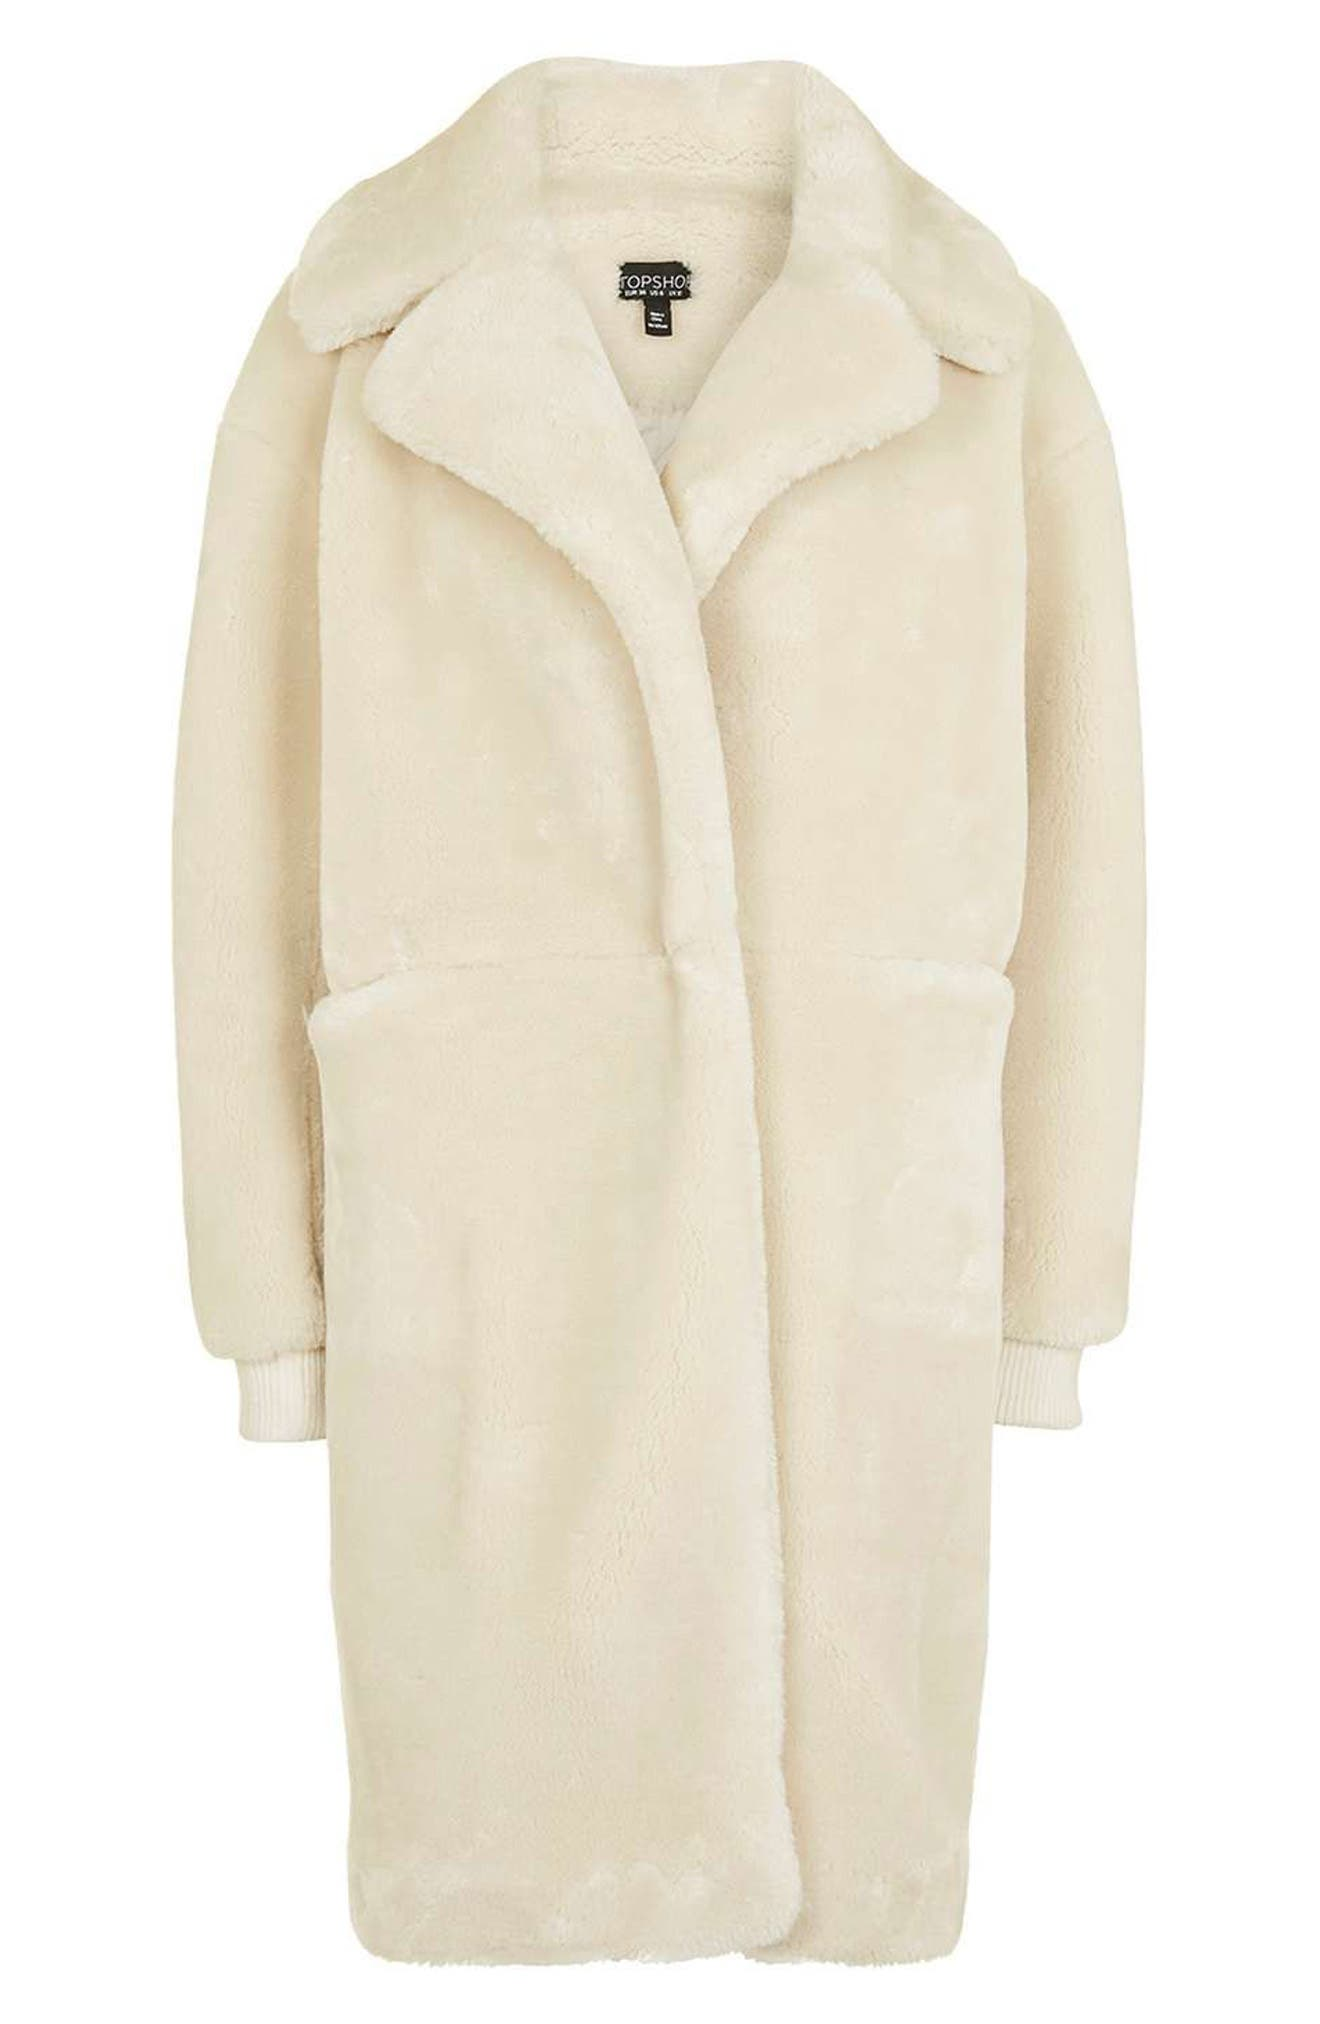 TOPSHOP,                             Polar Bear Faux Fur Coat,                             Alternate thumbnail 6, color,                             900